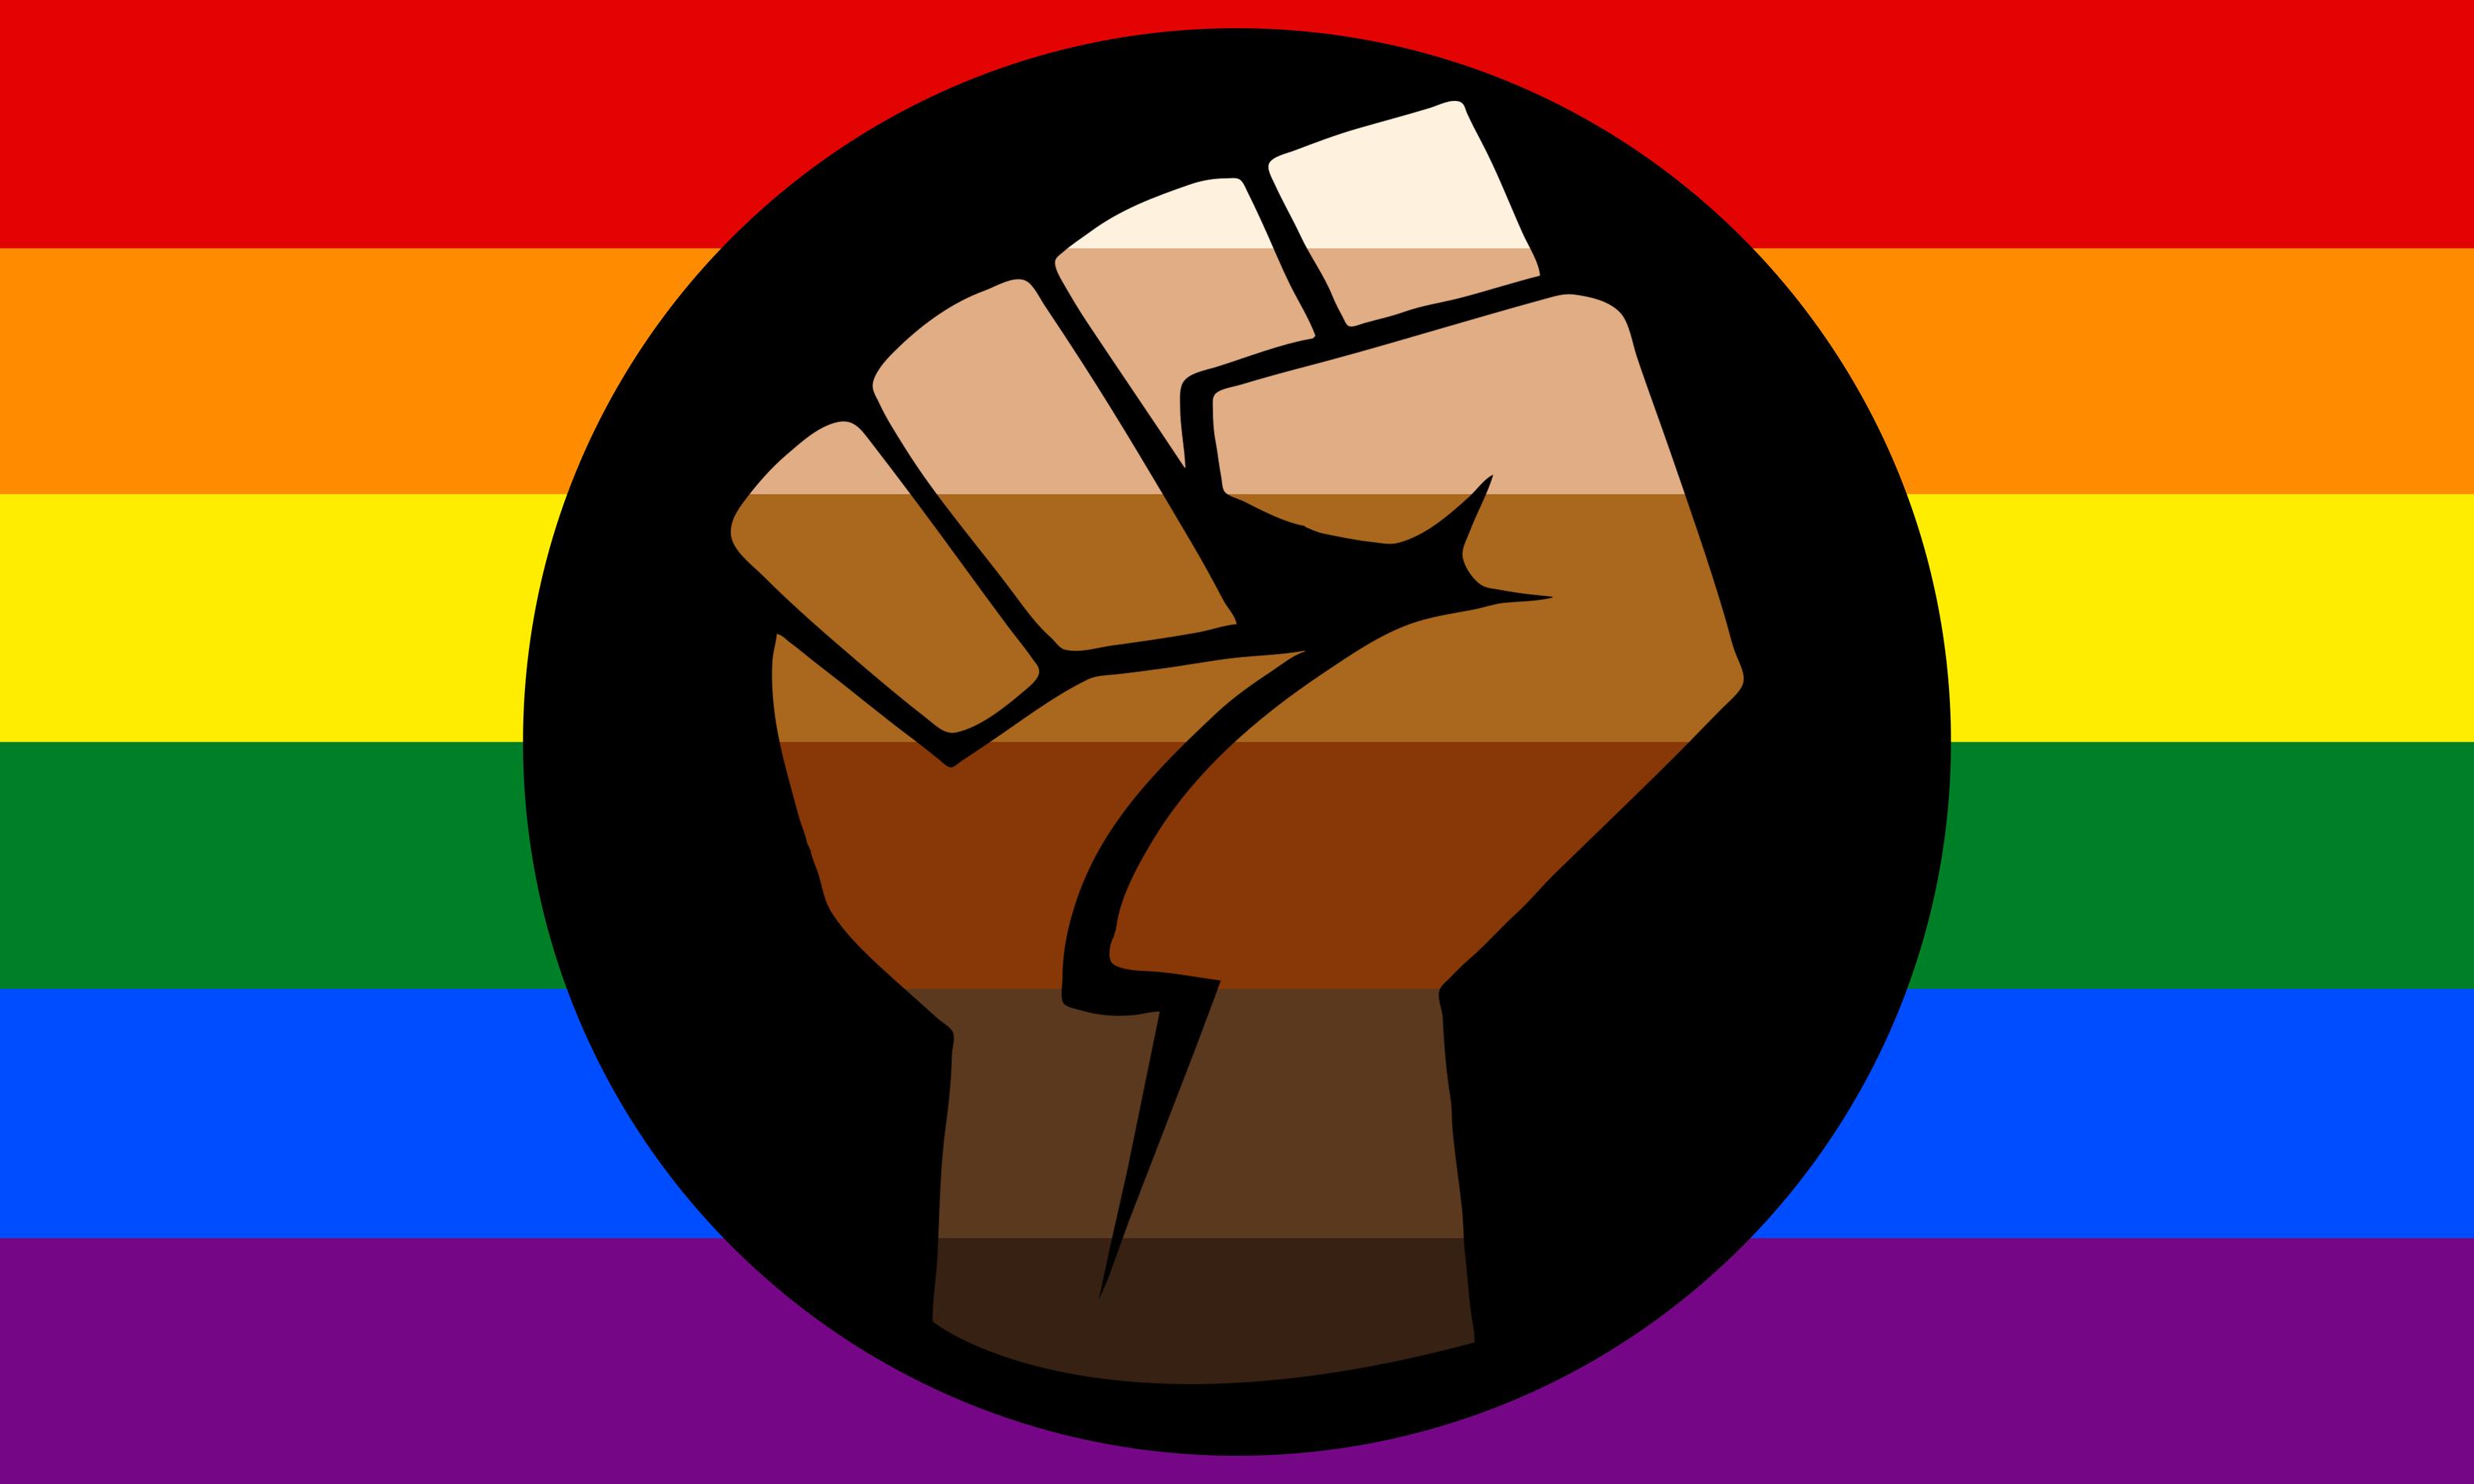 QPOC by Pride-Flags